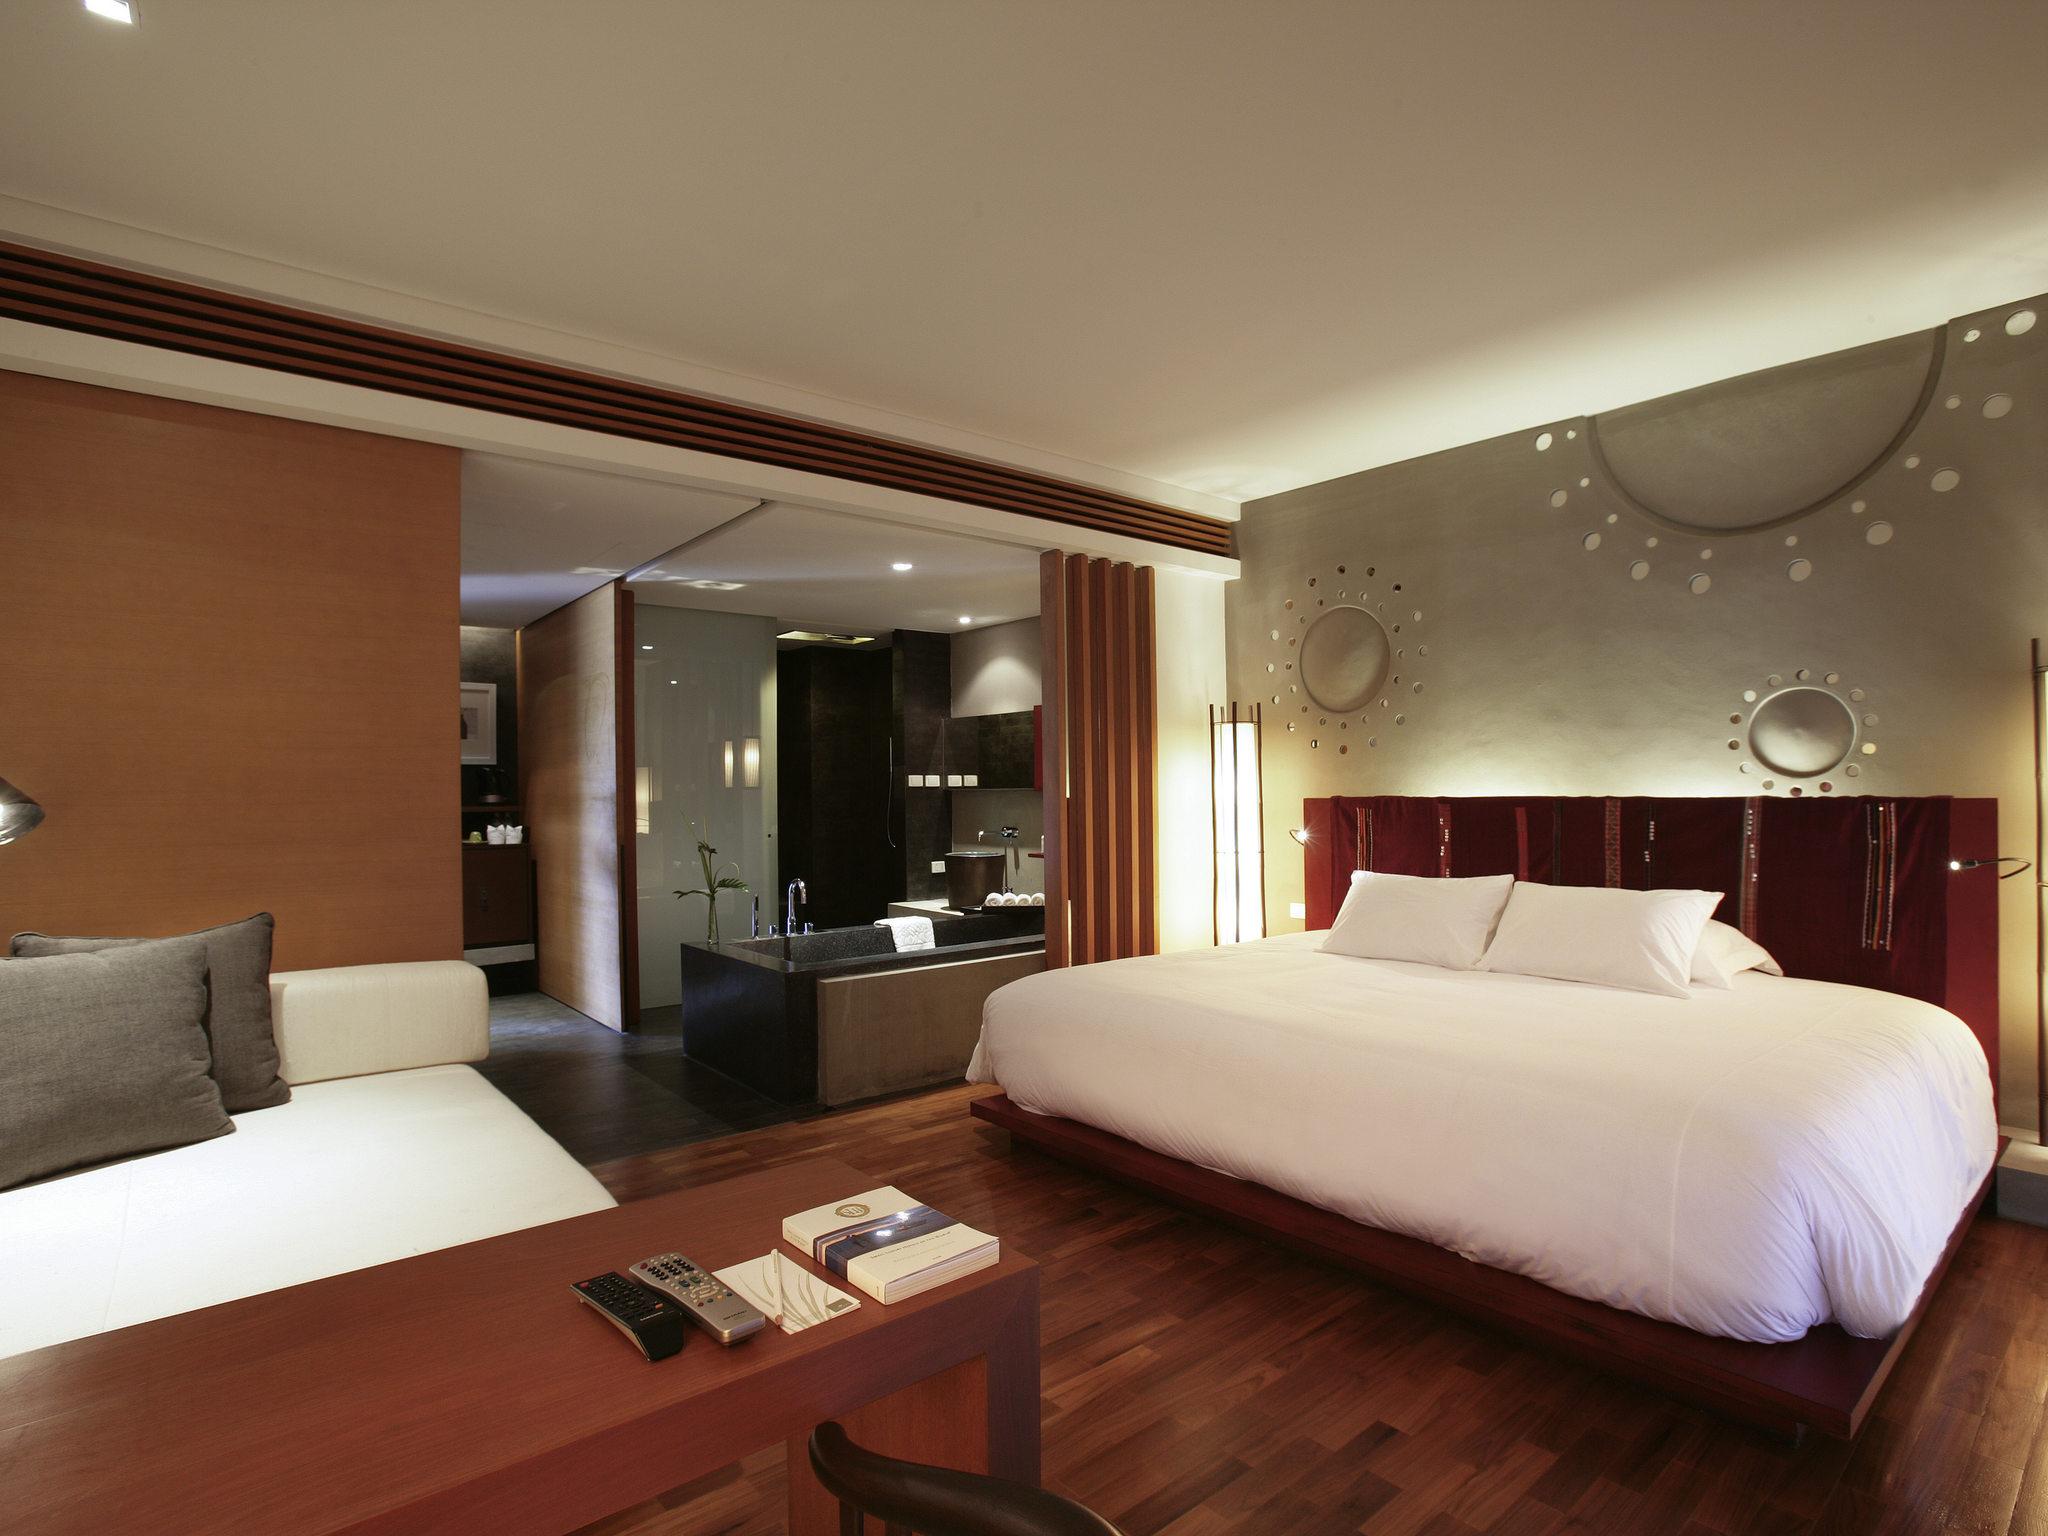 ... Rooms - Veranda High Resort Chiang Mai - MGallery by Sofitel ...